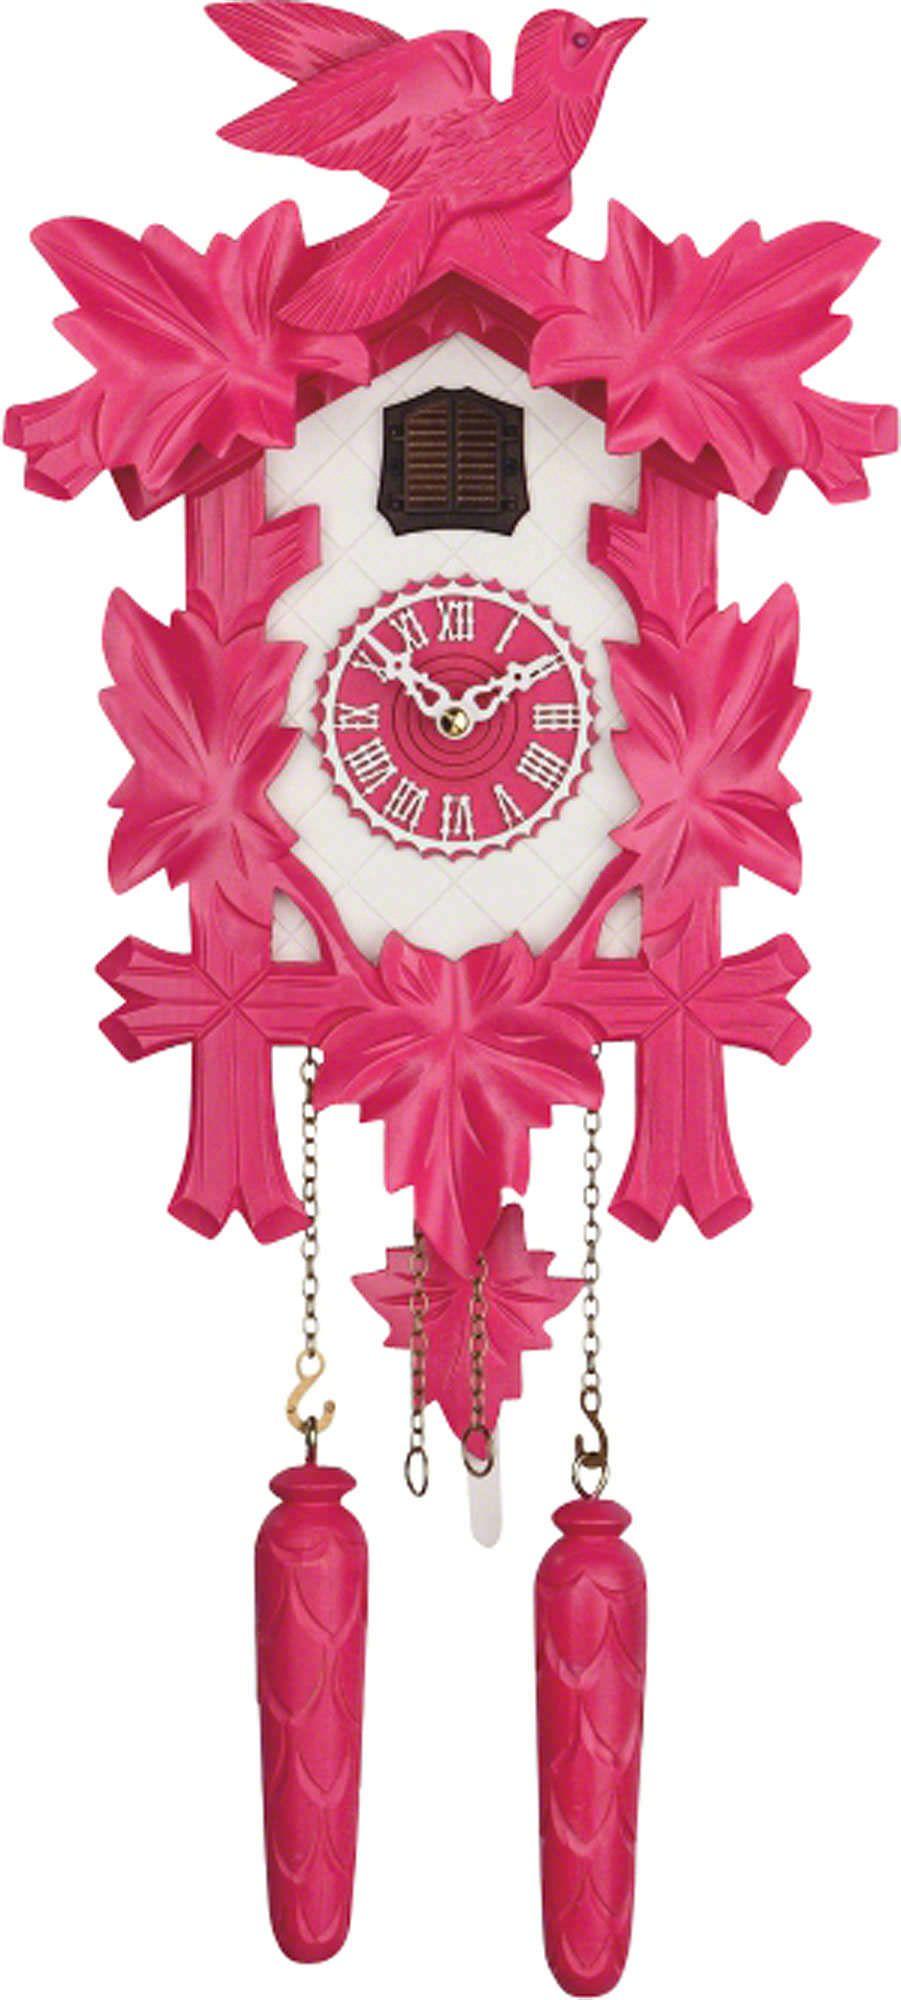 Cuckoo Clock Quartz Movement Modern Art Style 35cm By Trenkle Uhren 350 20 Q Pink Weiss Modern Cuckoo Clocks Modern Art Styles Clock